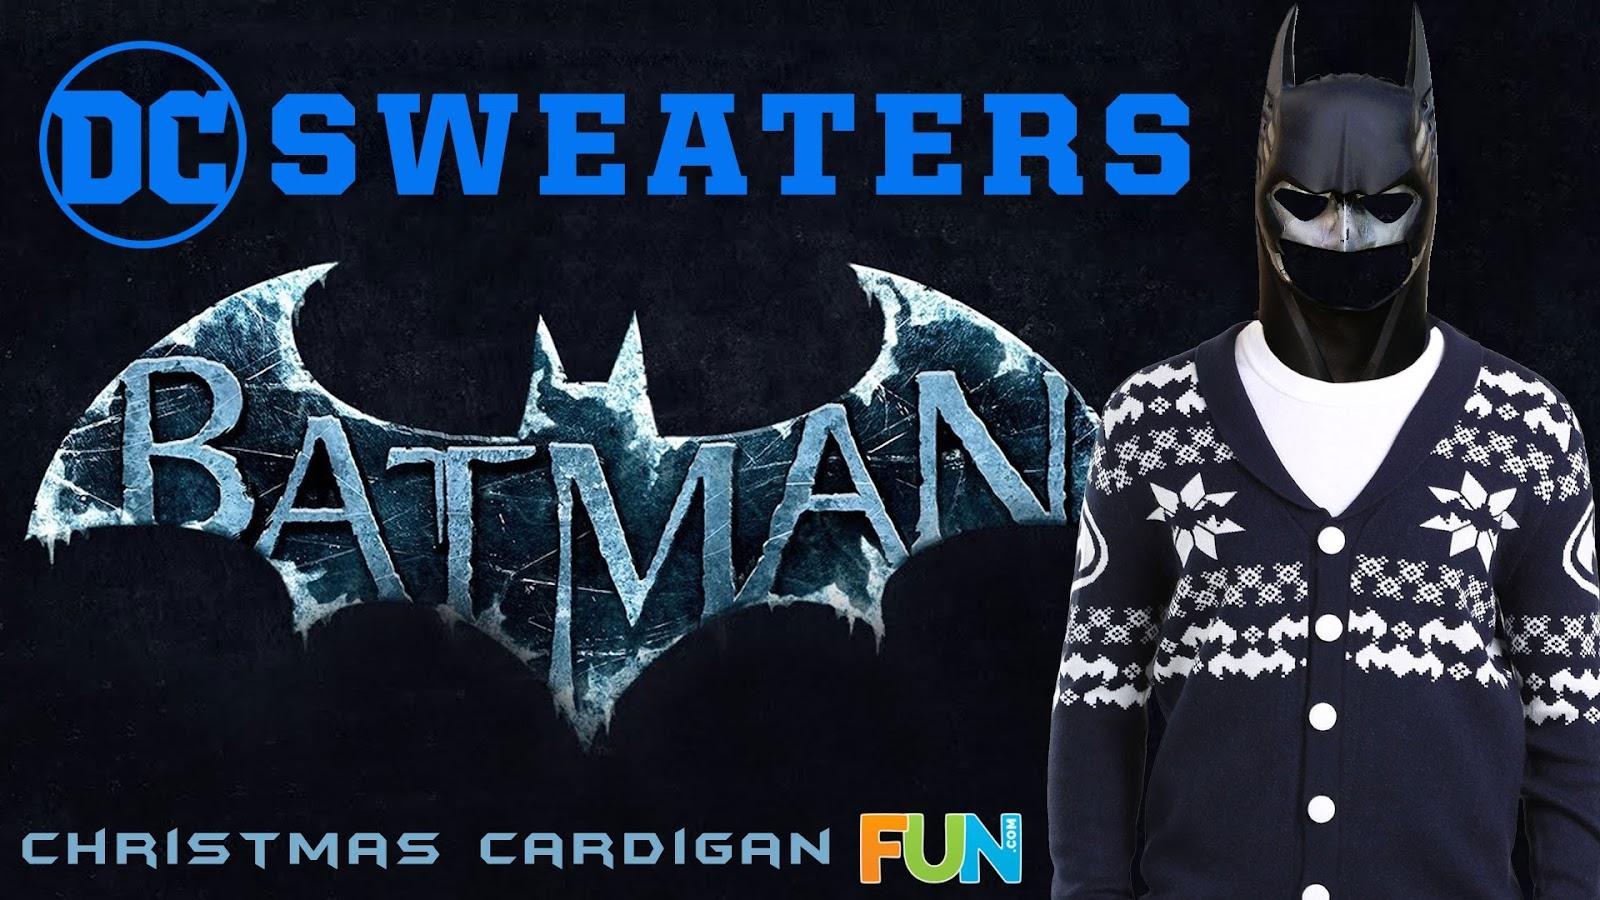 Batman Christmas.Batman Christmas Cardigan Dc Sweaters Spotlight Fanboys